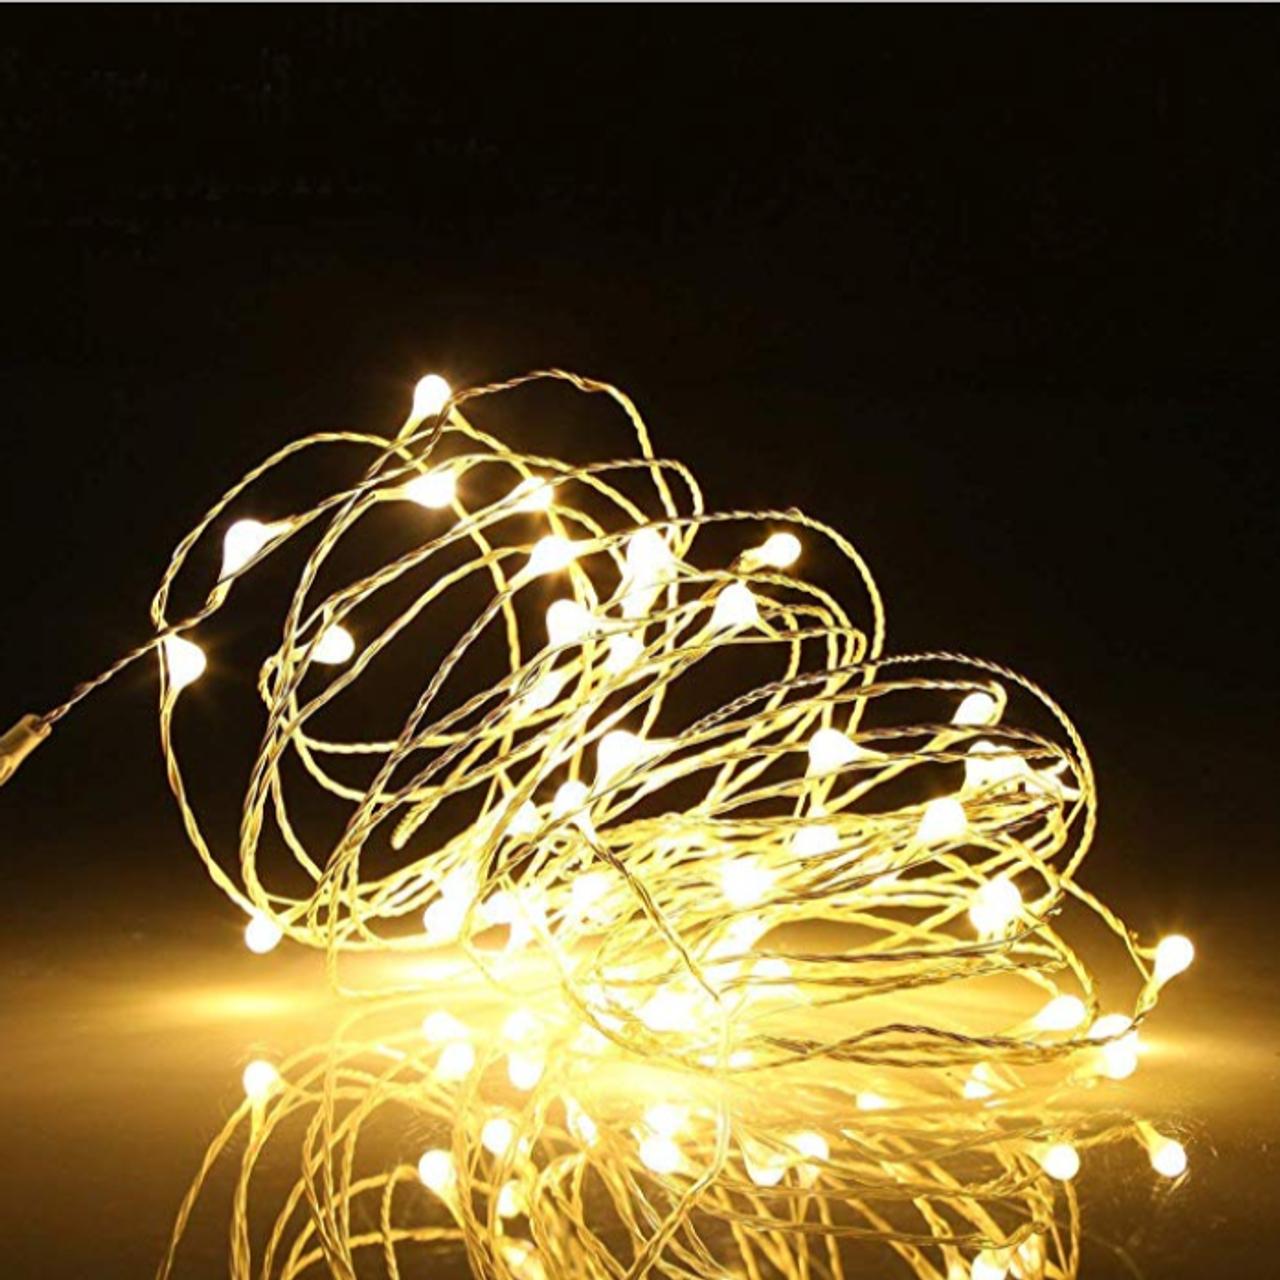 LED Fairy Lights 33 feet 100 LED LIGHTS- Dual power (Battery /USB) Warm White